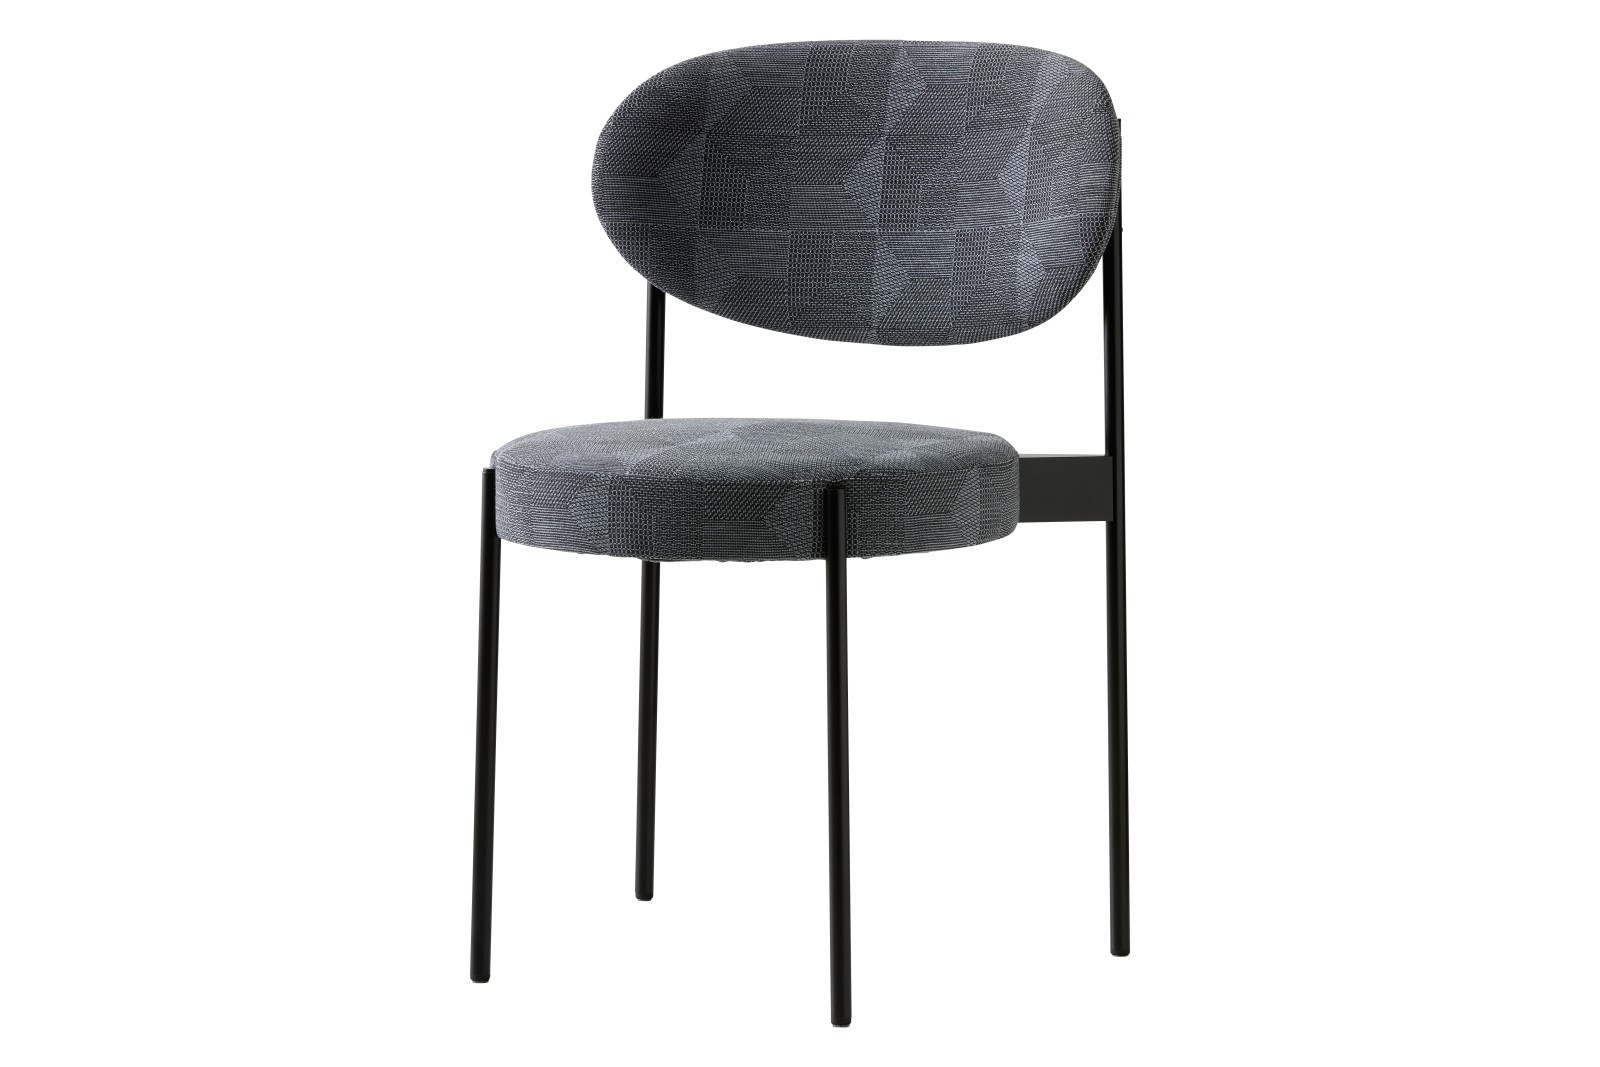 Series 430 Chair - set of 2 Hallingdal 65 Band C, 43 Black